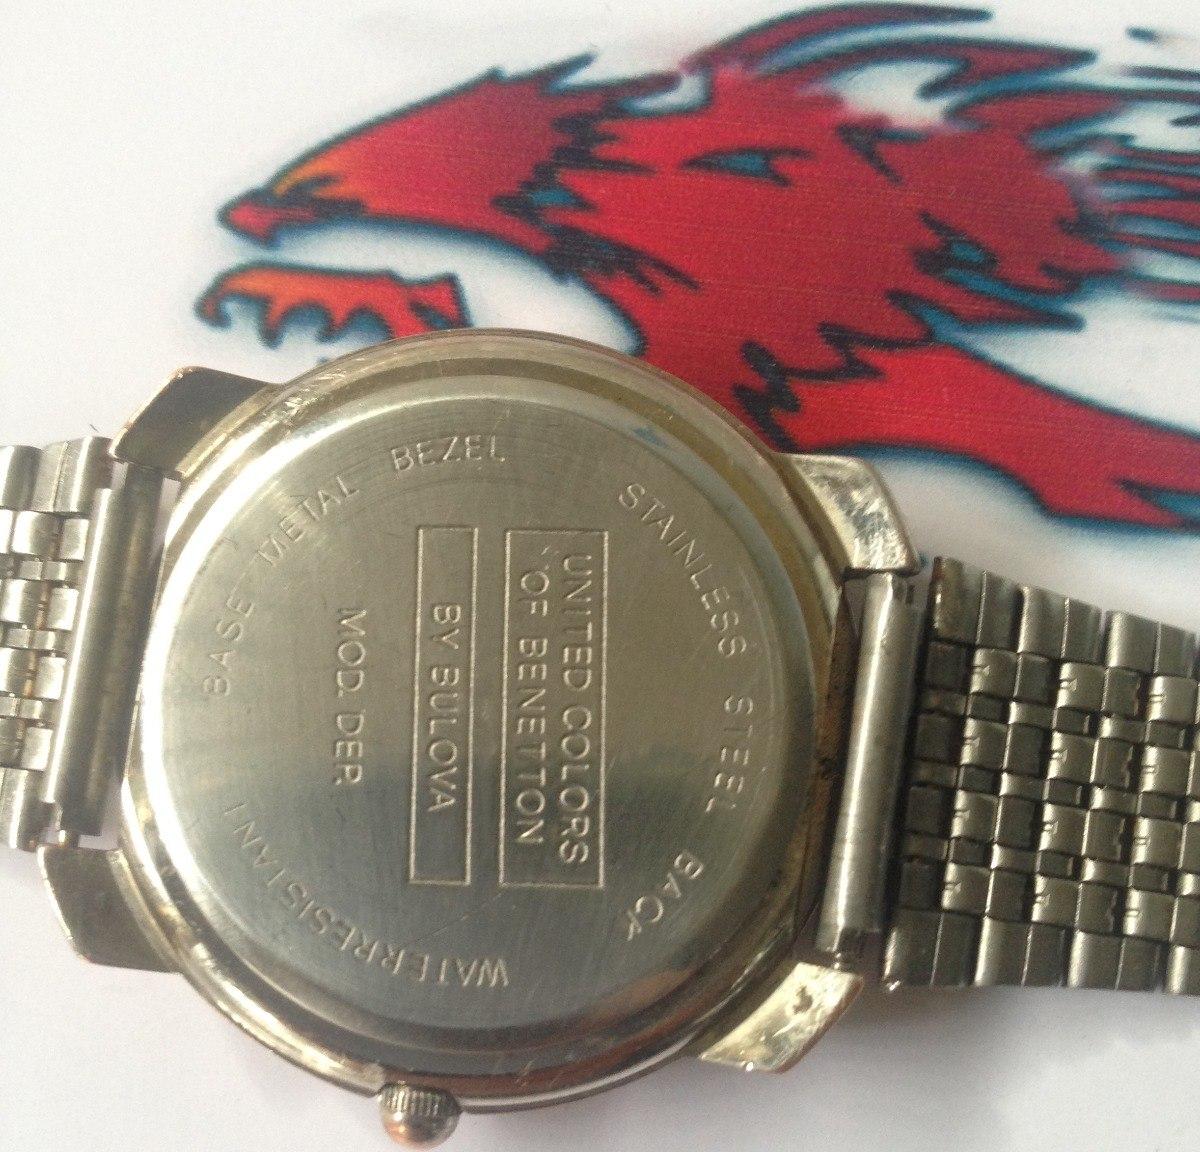 62559a644d8 relógio benetton sportsystem. Carregando zoom.